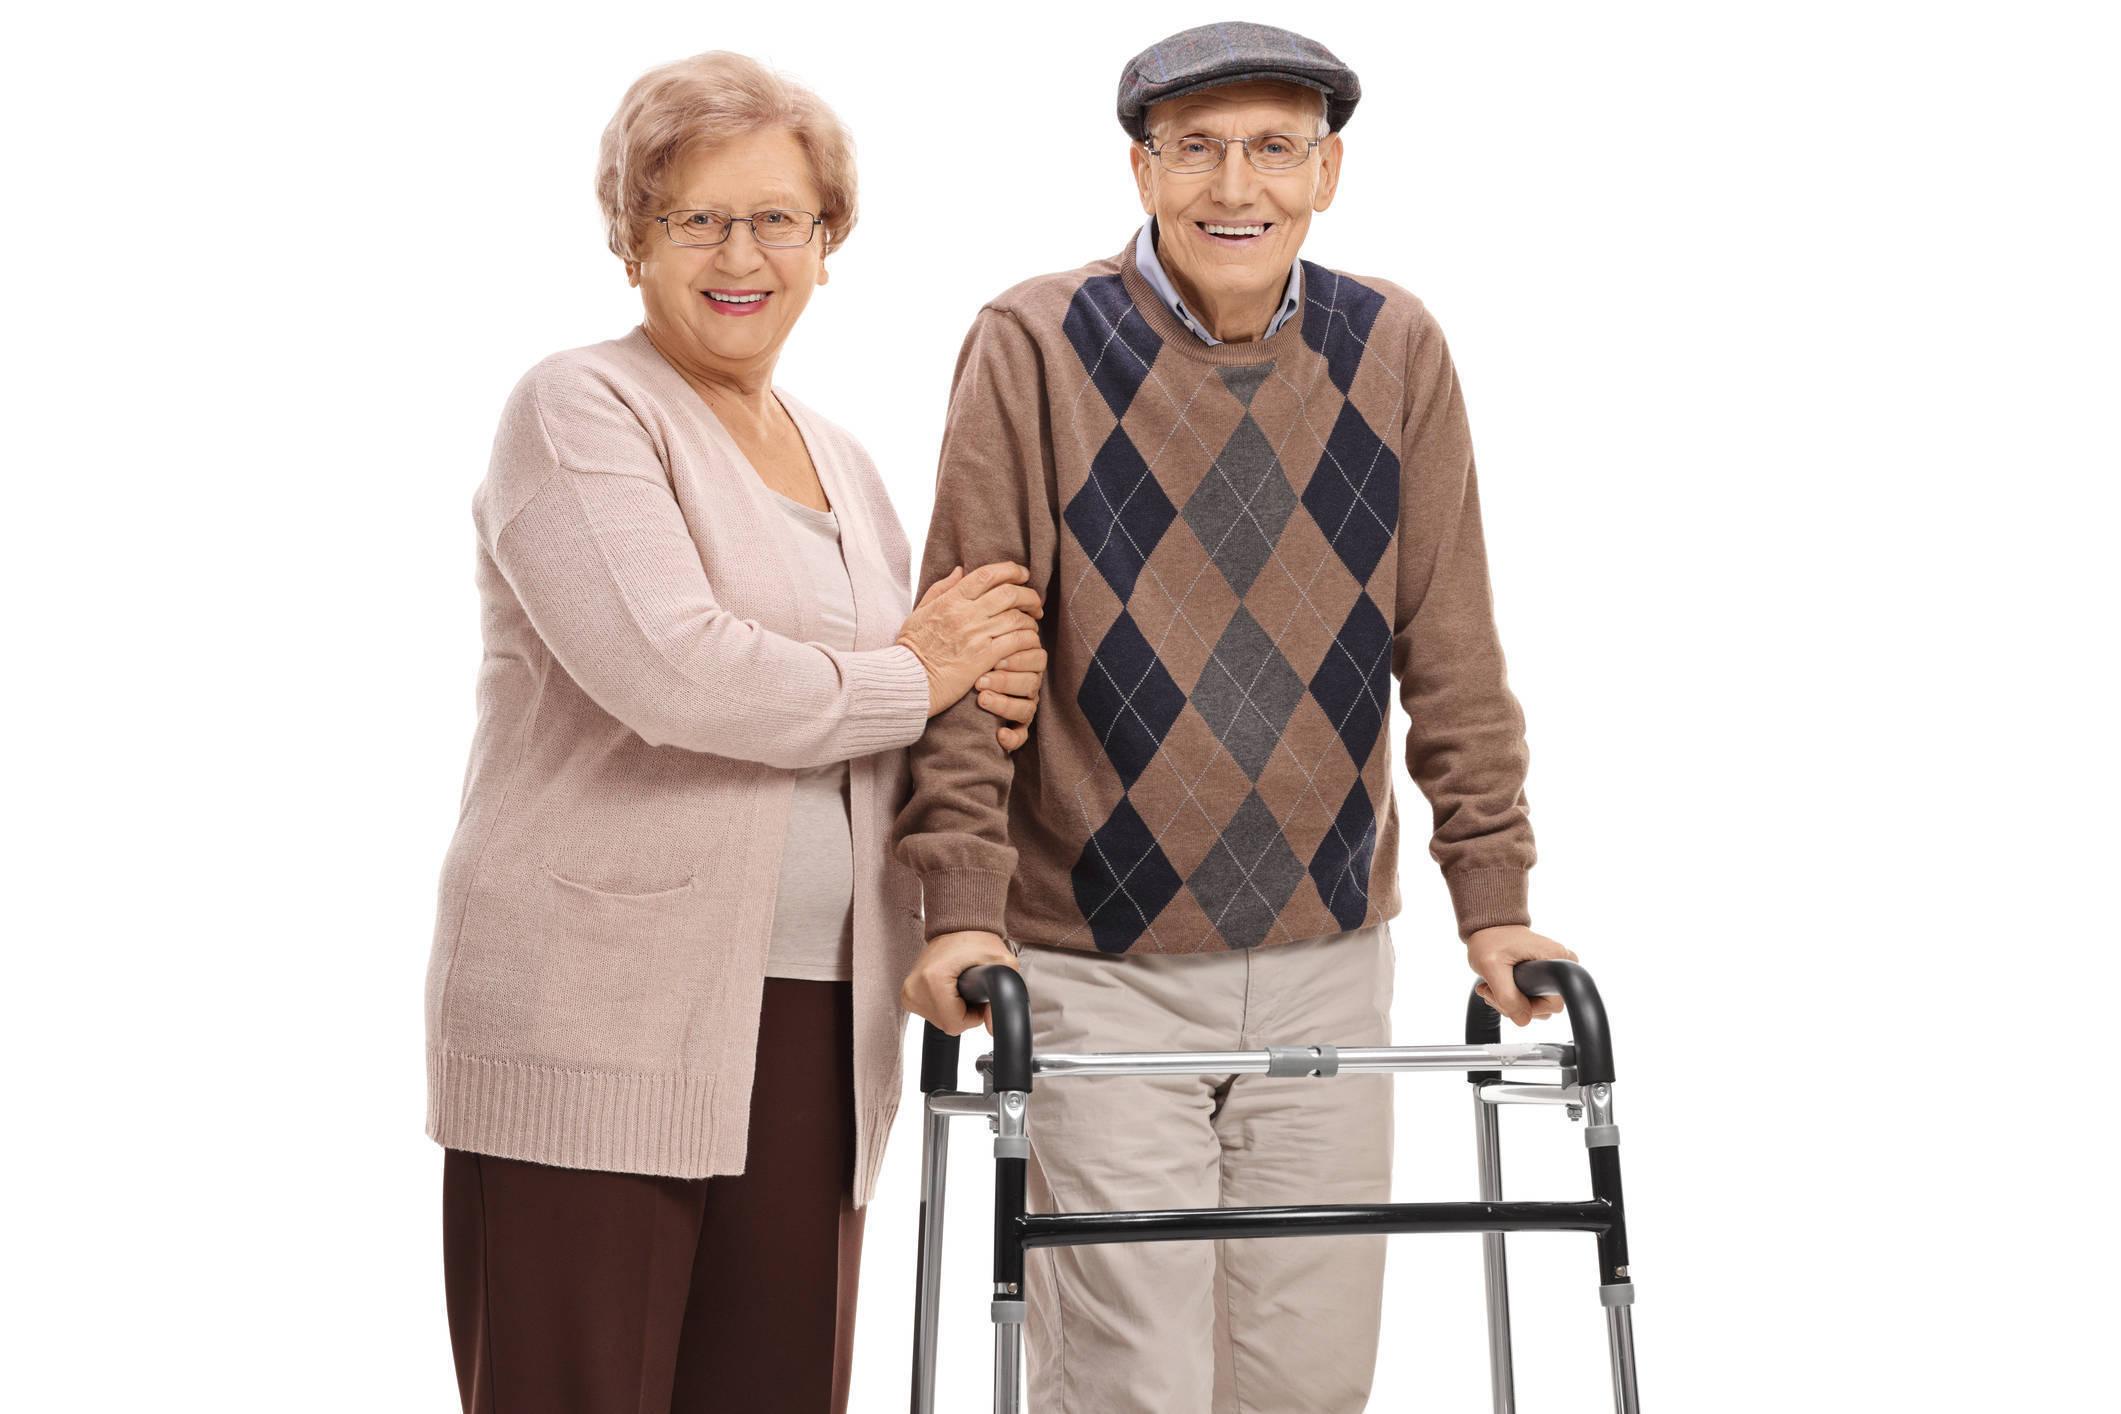 a66ebf8d84fdb0883008_7892bfe659f825735998_Elderly_Couple_KV_Post_Making_Home_Senior_Safe.jpg